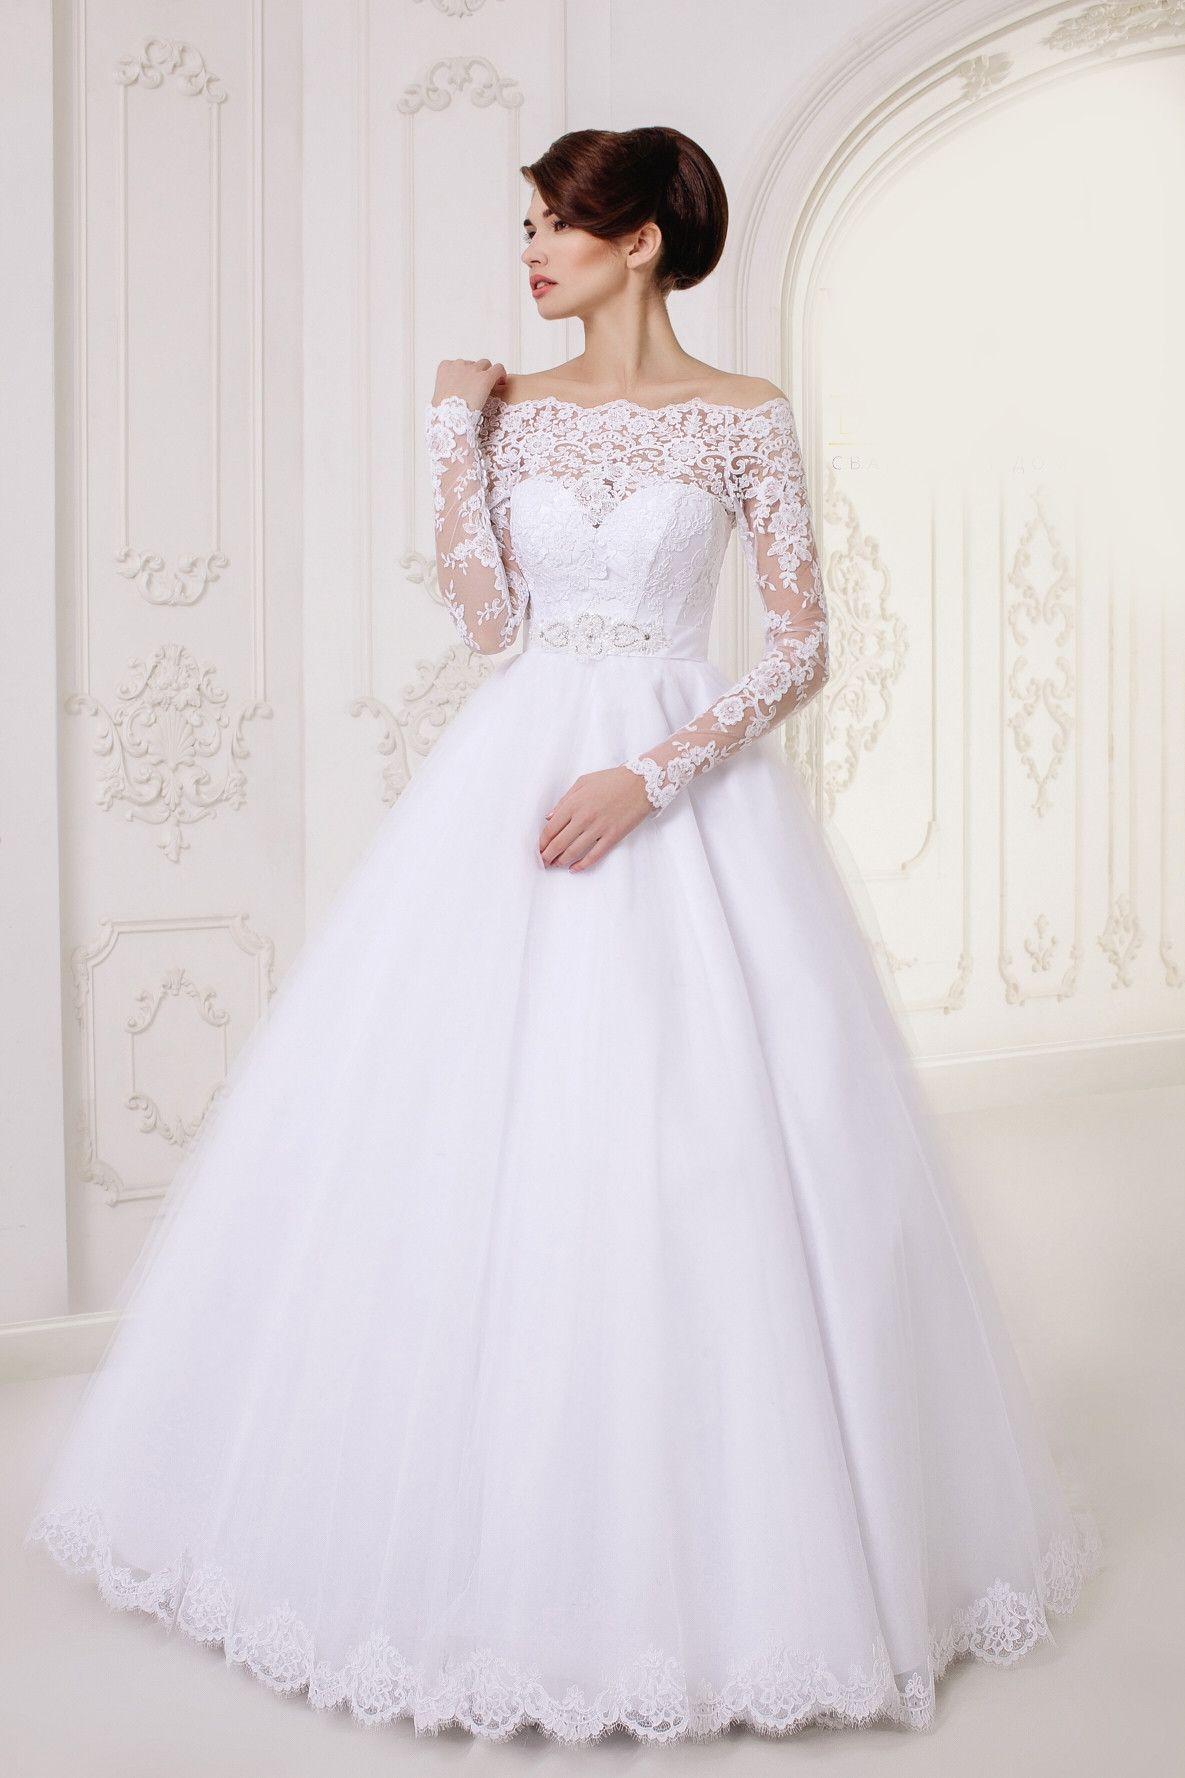 Long ALine Lace Long Sleeves Wedding Dress My Best